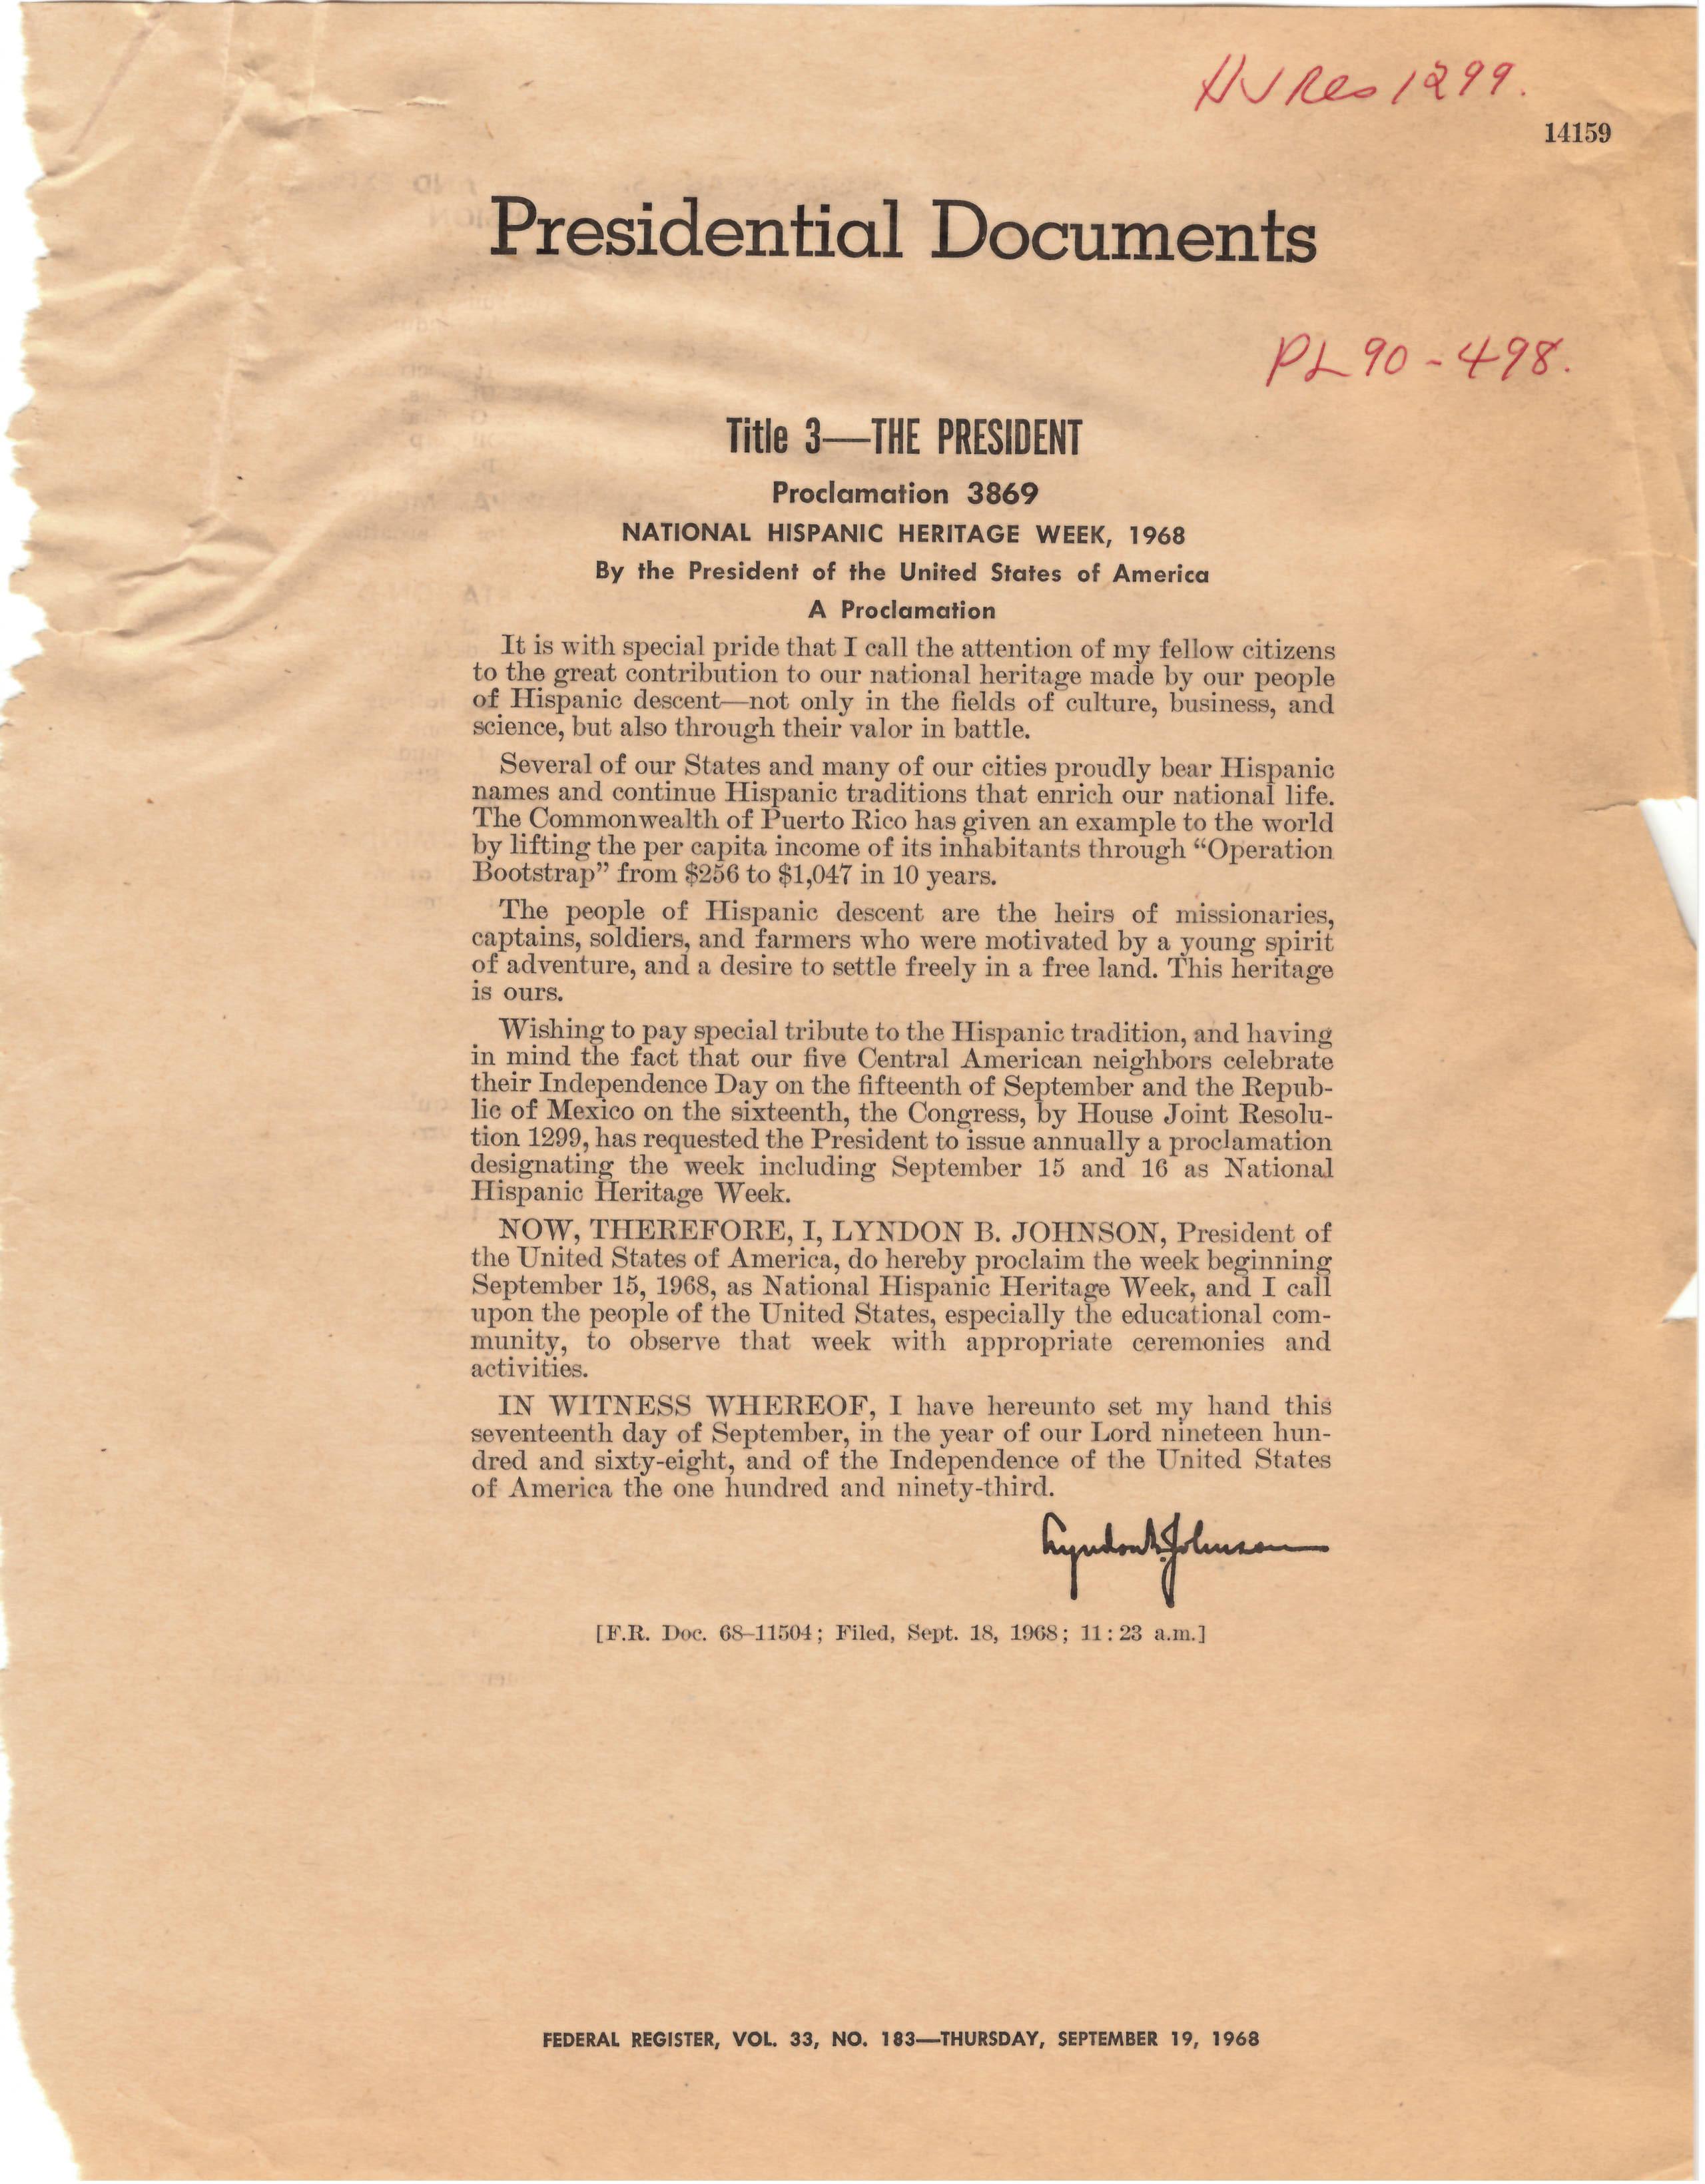 Proclamation 3869 (LBJ)